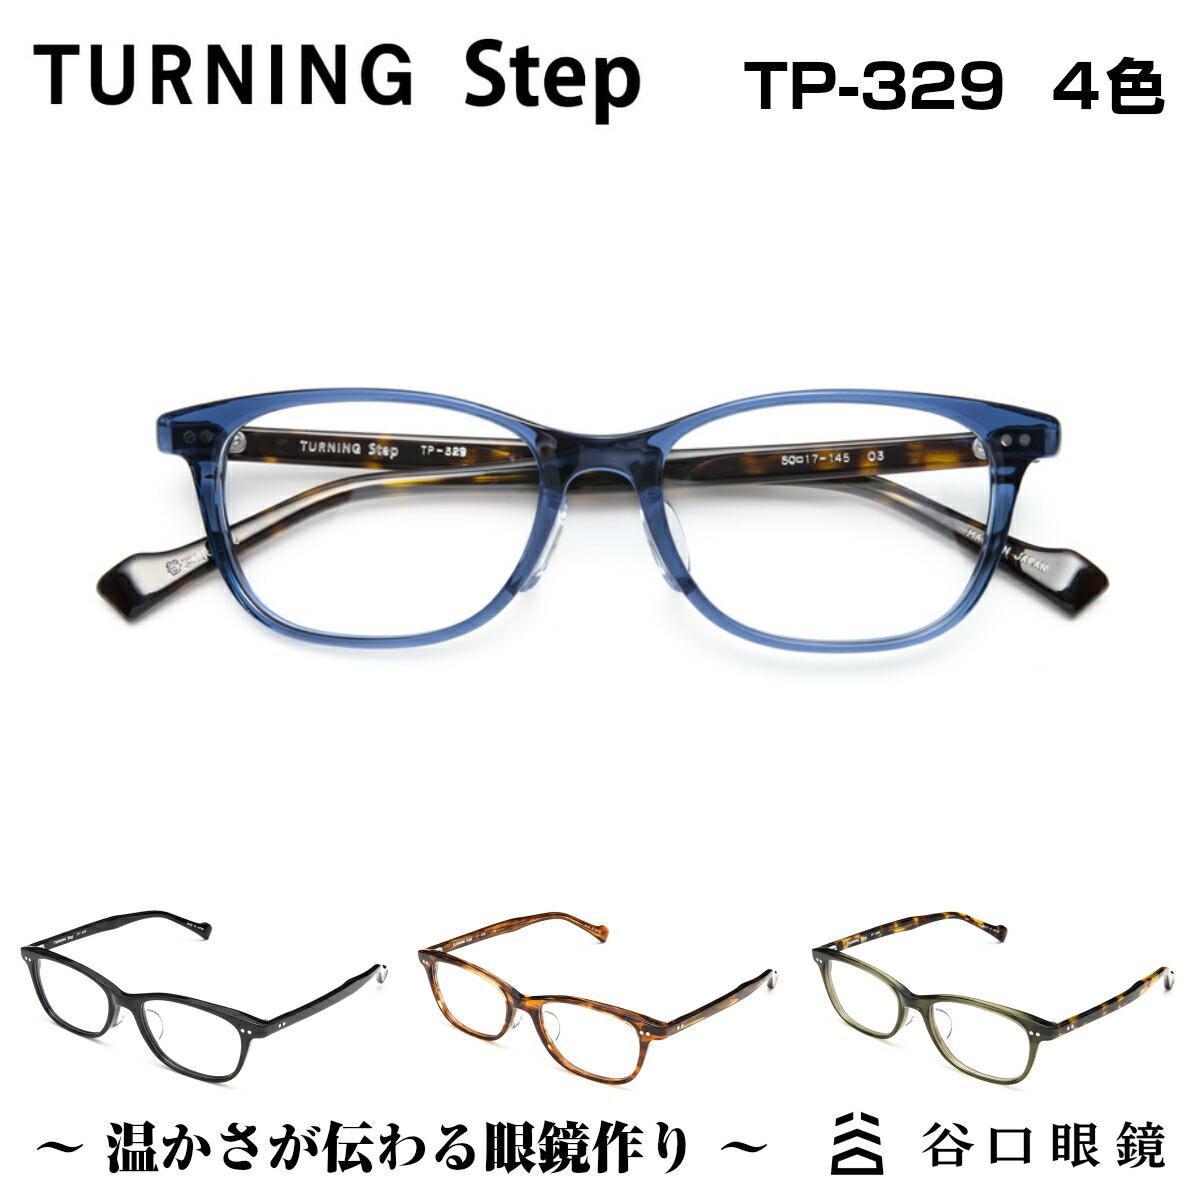 TURNING Step ターニング ステップ 谷口眼鏡 TP-329 4色 メガネ 眼鏡 めがね フレーム 度付き 度入り 男性 女性 ユニセックス セル スクエア 日本製 国産 鯖江 SABAE シンプル 軽い 軽量 【送料無料】